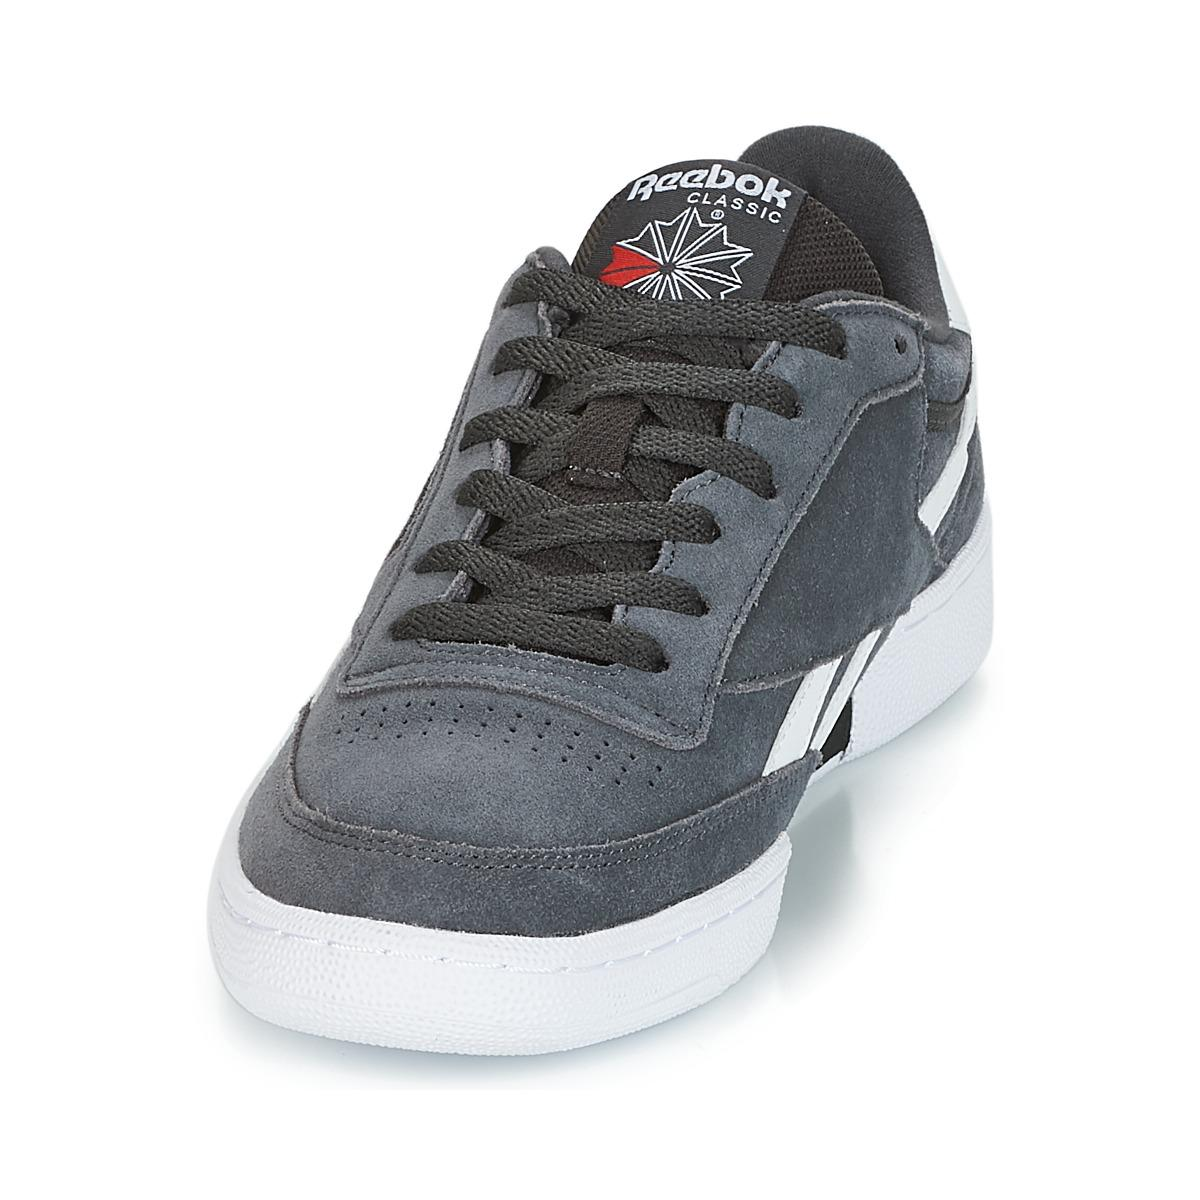 Reebok - Revenge Plus Mu Men s Shoes (trainers) In Blue for Men - Lyst.  View fullscreen d1d5385b3